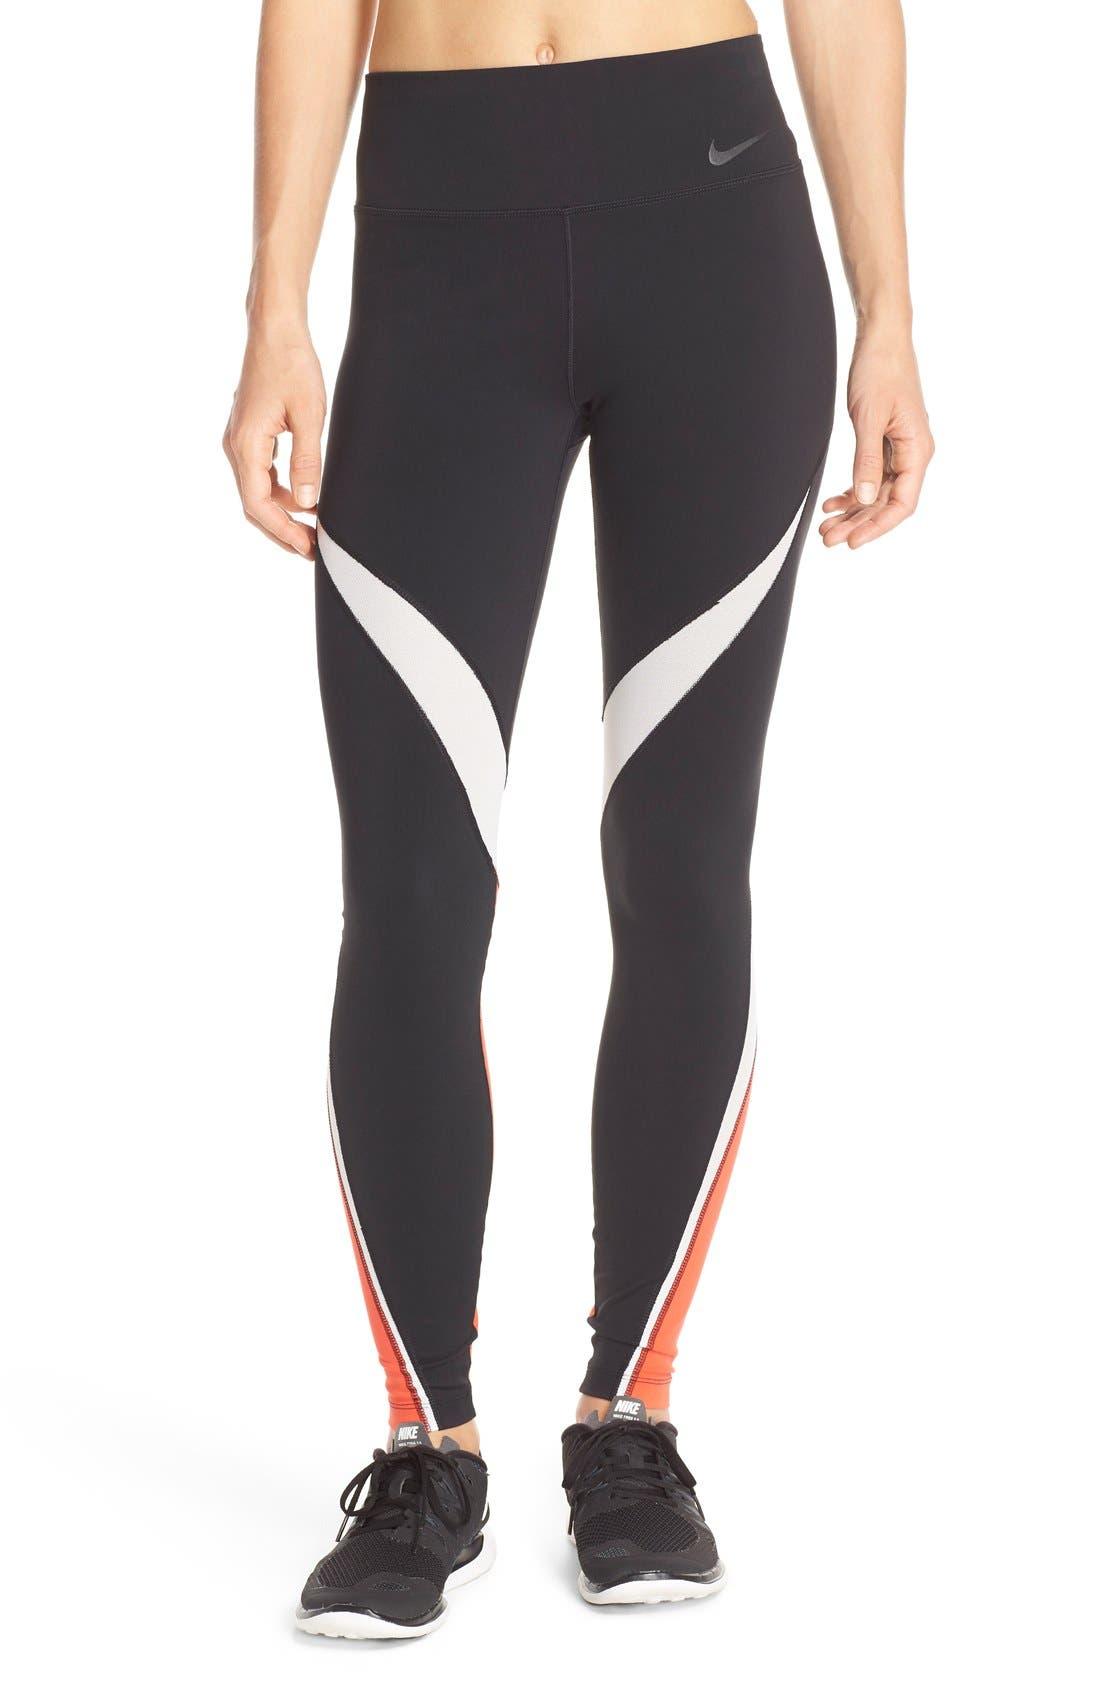 Main Image - Nike 'Legendary' Mesh Inset Dri-FIT Tights